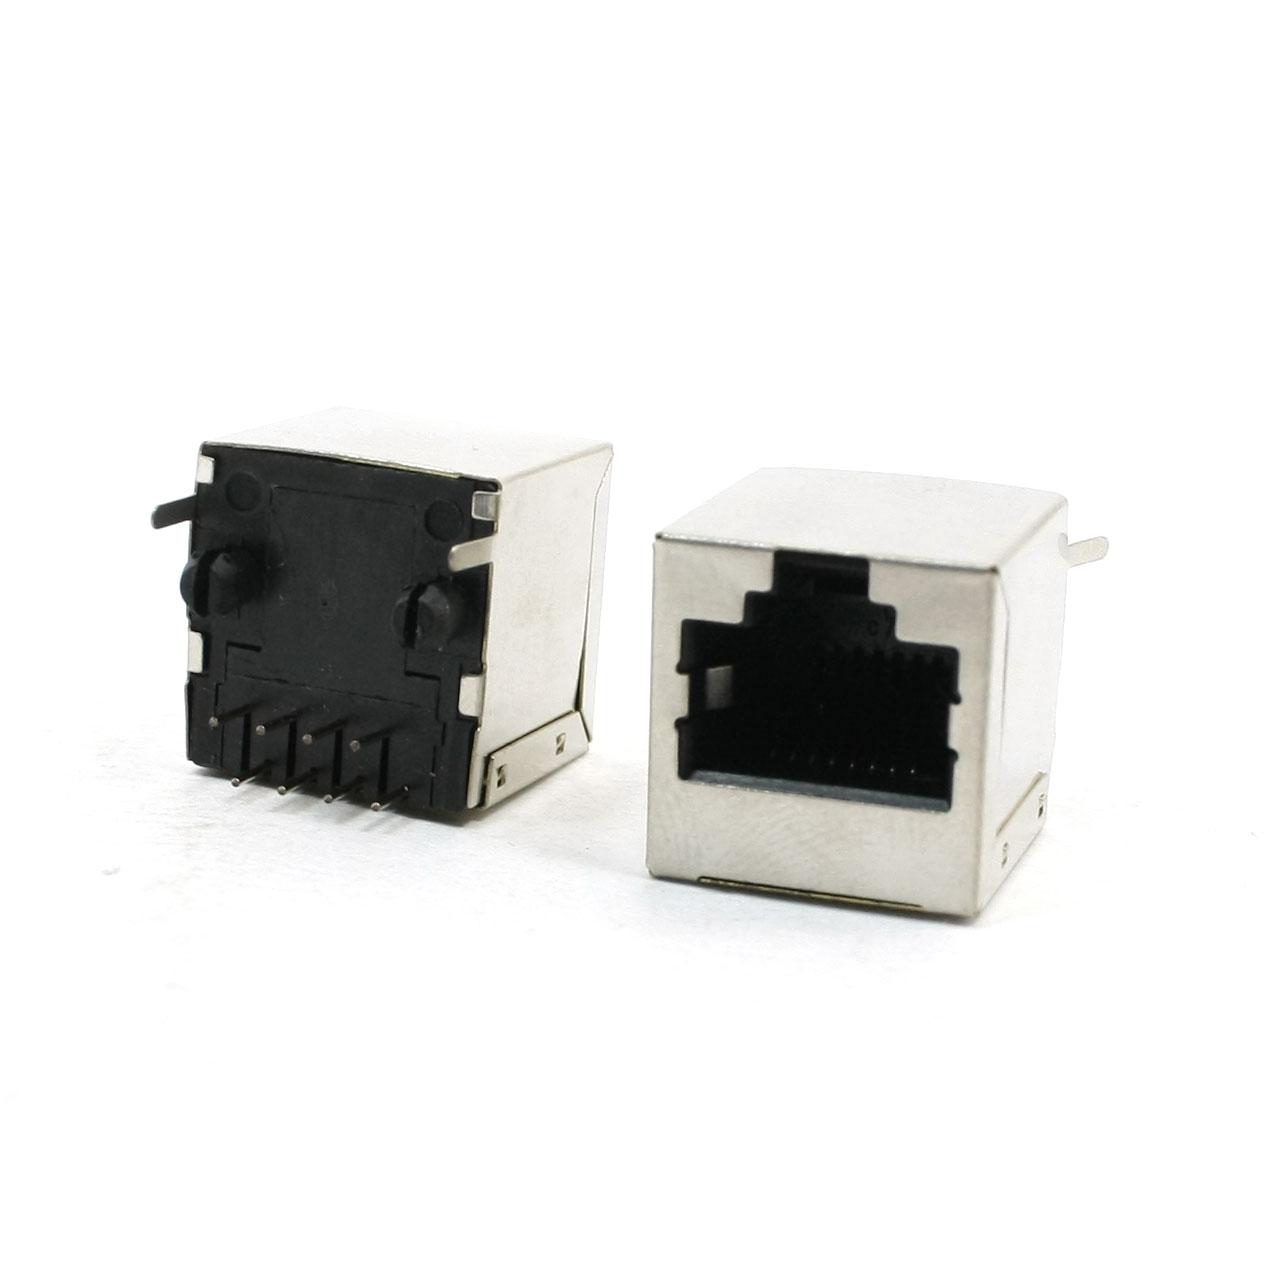 2 Pcs Vertical PCB Mount 8 Pins 8P8C RJ45 Socket 20x17x16mm for LAN